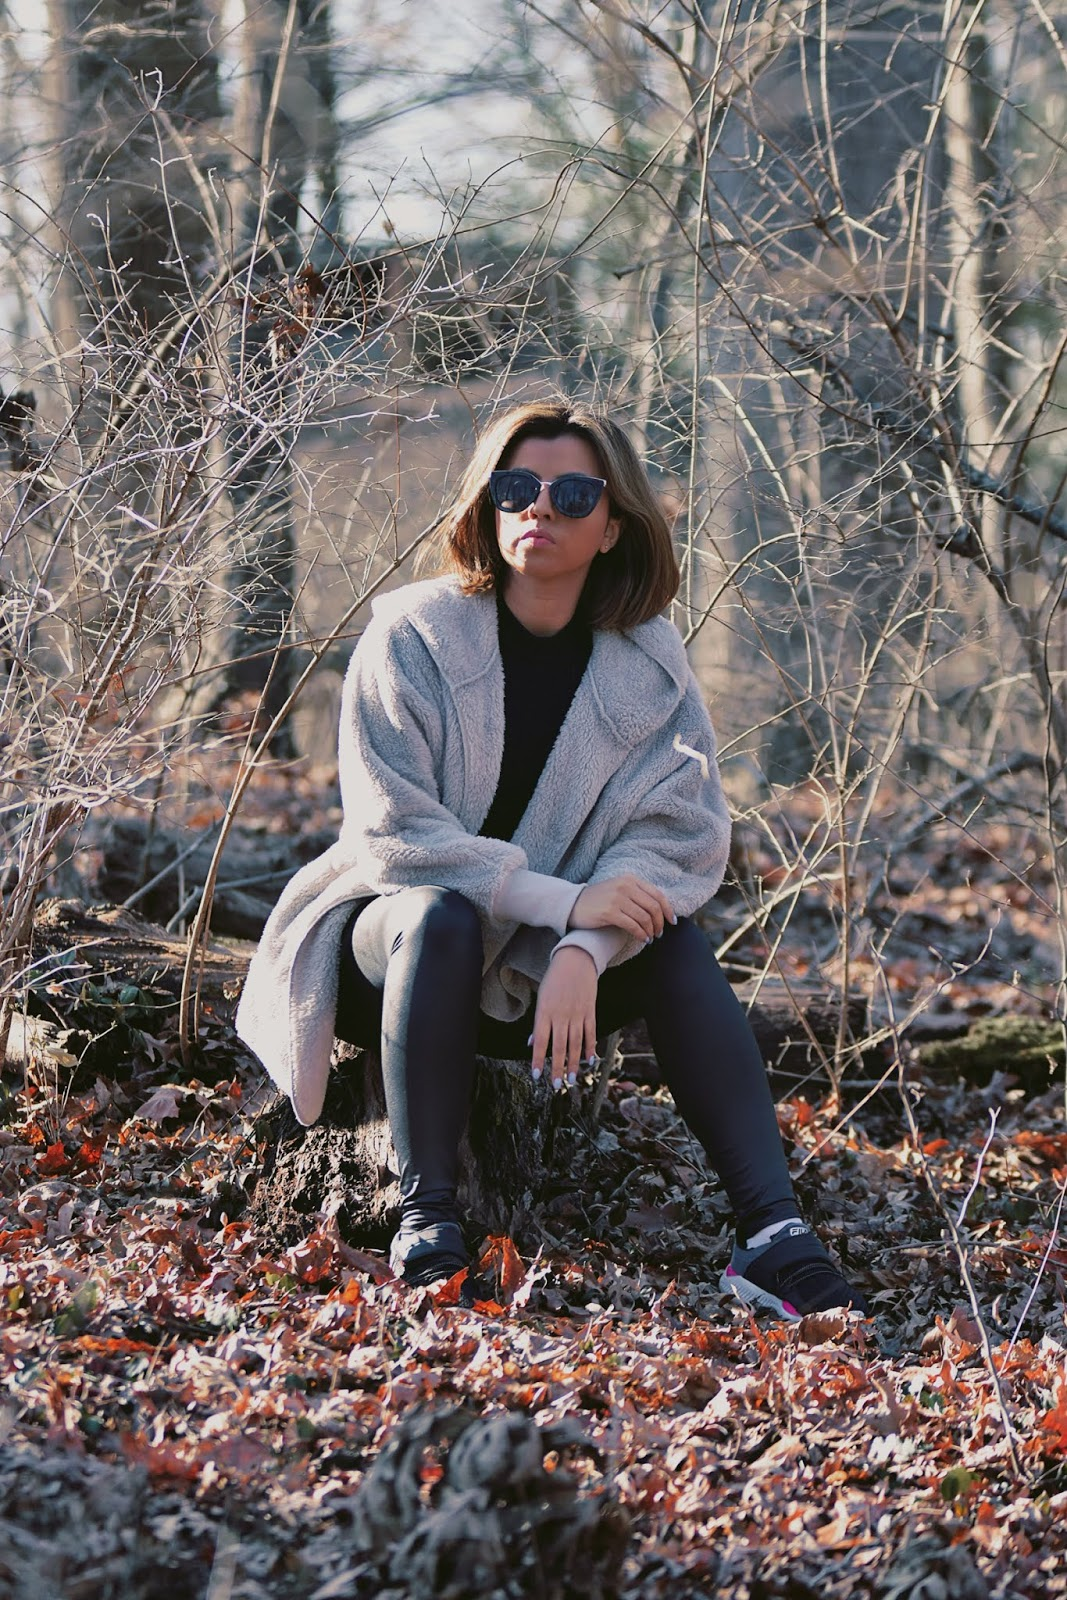 How To Wear A  Oversized Hooded Cardigan-mariestilo-dcblogger-lookbook store-traveller-modaelsalvador-marisolflamenco-canal de mariestilo-